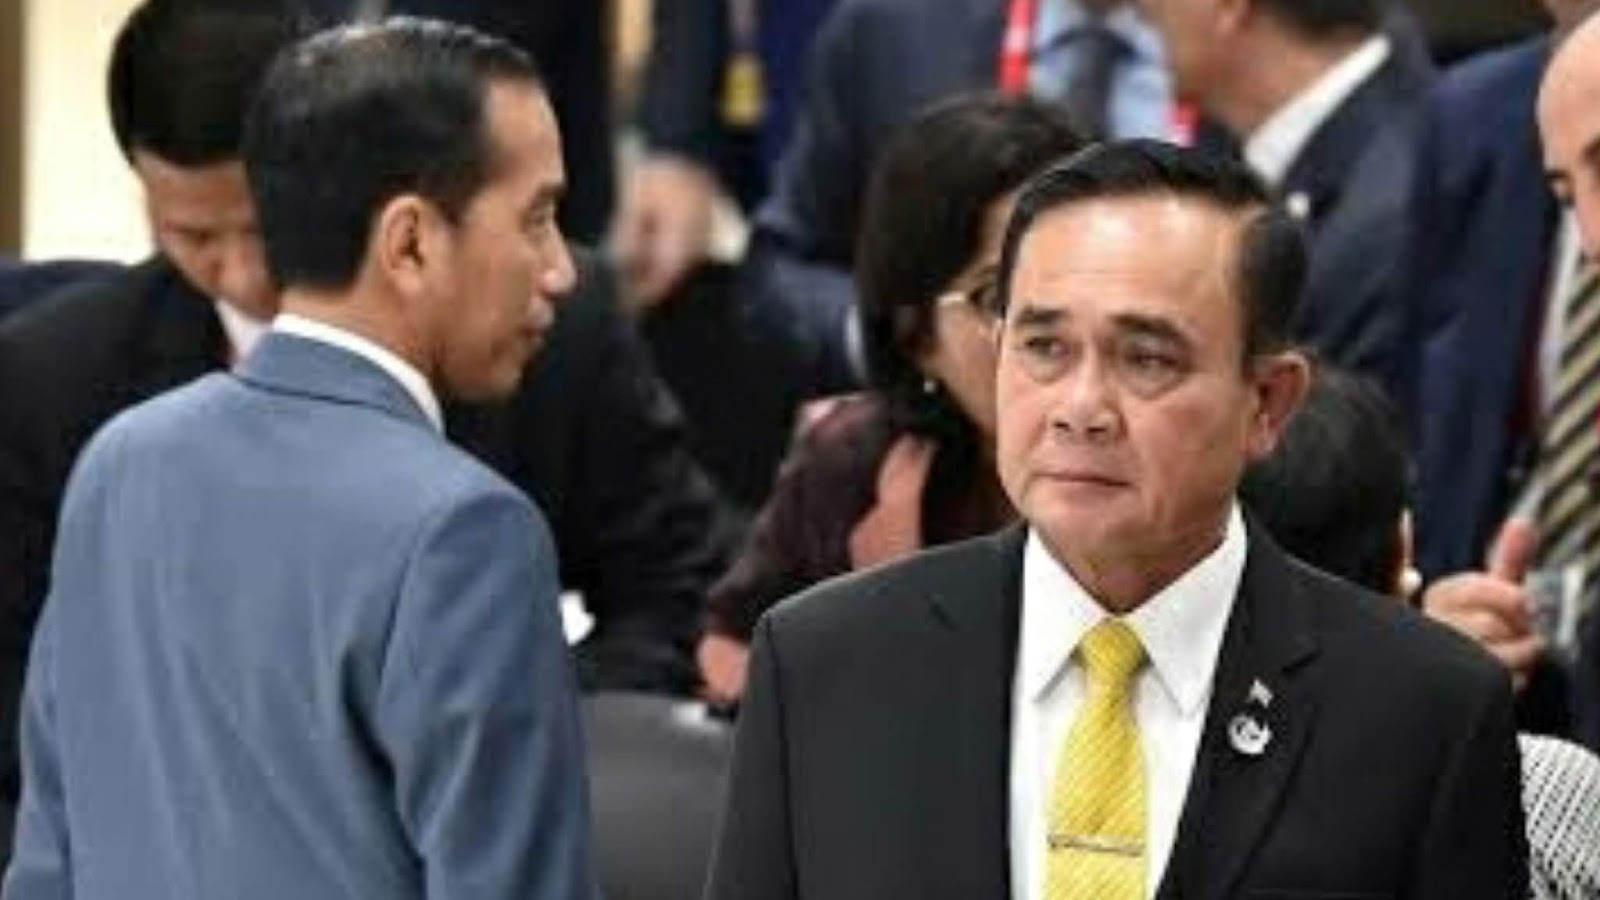 Cegah Penyebaran Corona, Thailand Lockdown hingga Akhir April 2020